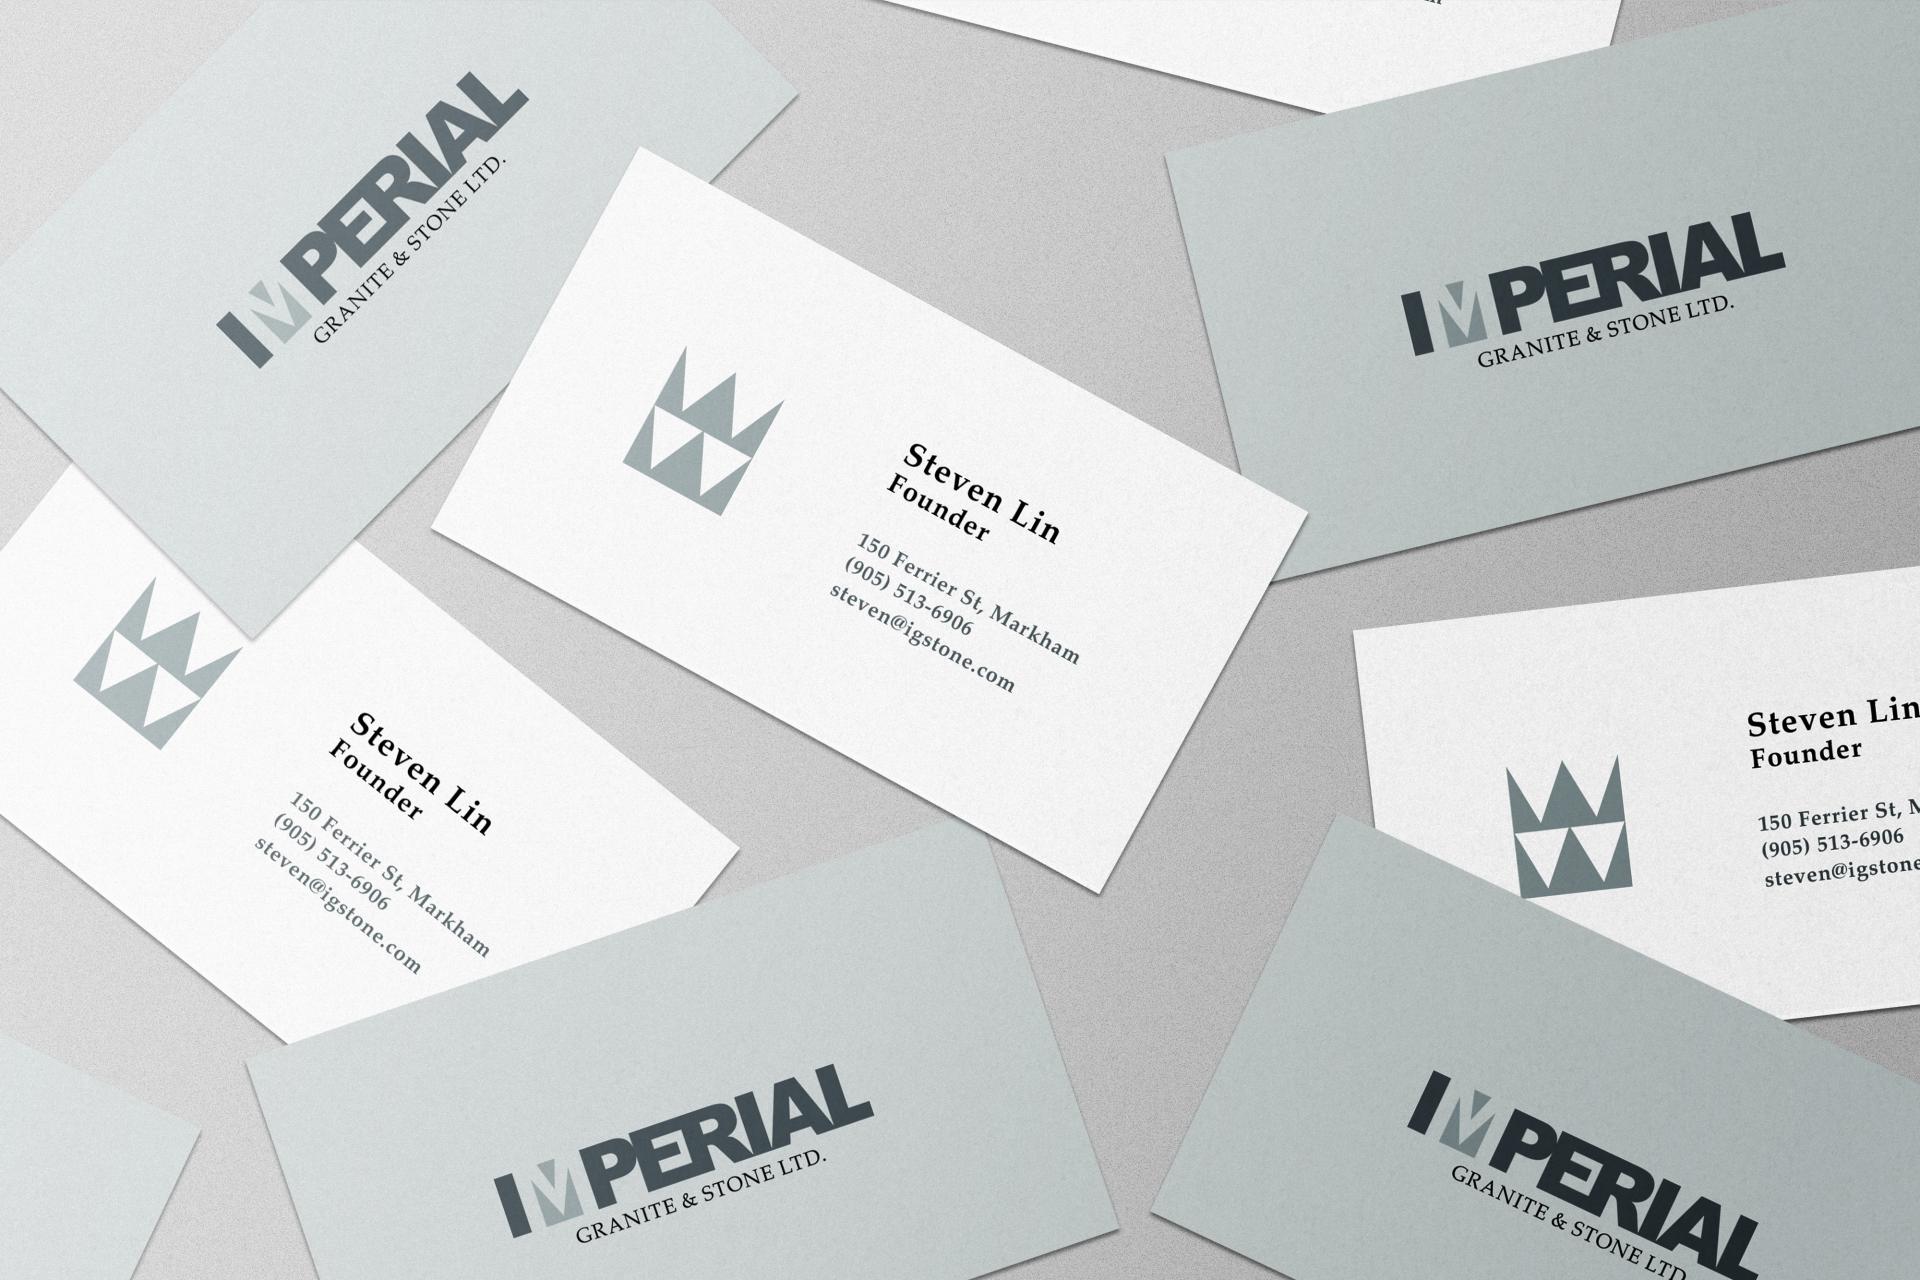 Imperial Granite & Stone Ltd. Business Cards